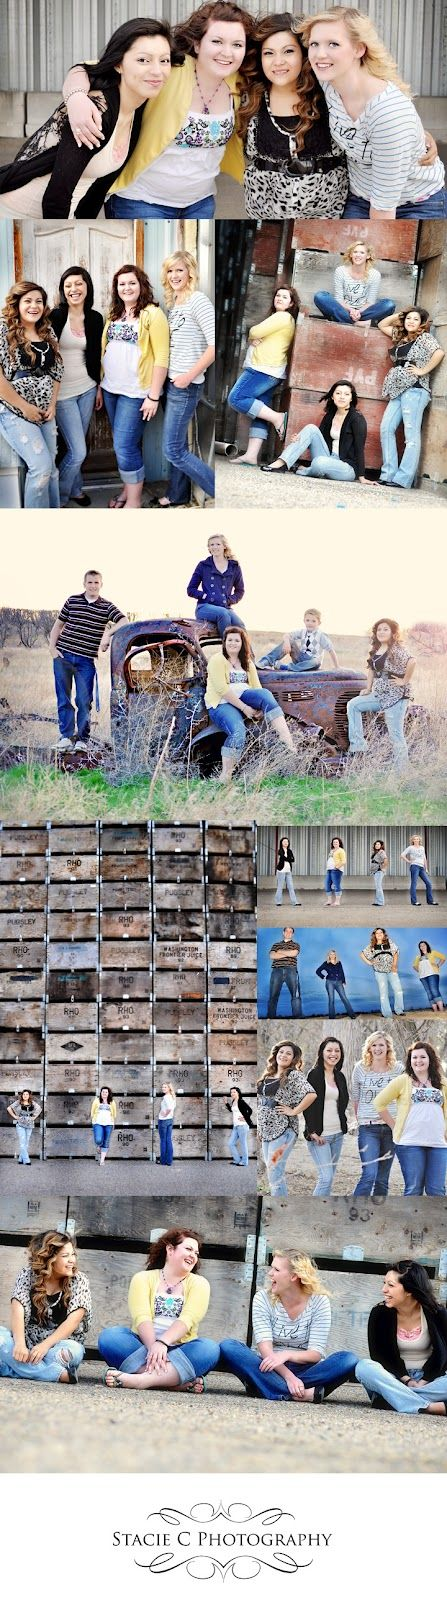 Stacie C. Fotografie: Freunde (New Plymouth Idaho Senior Fotograf)